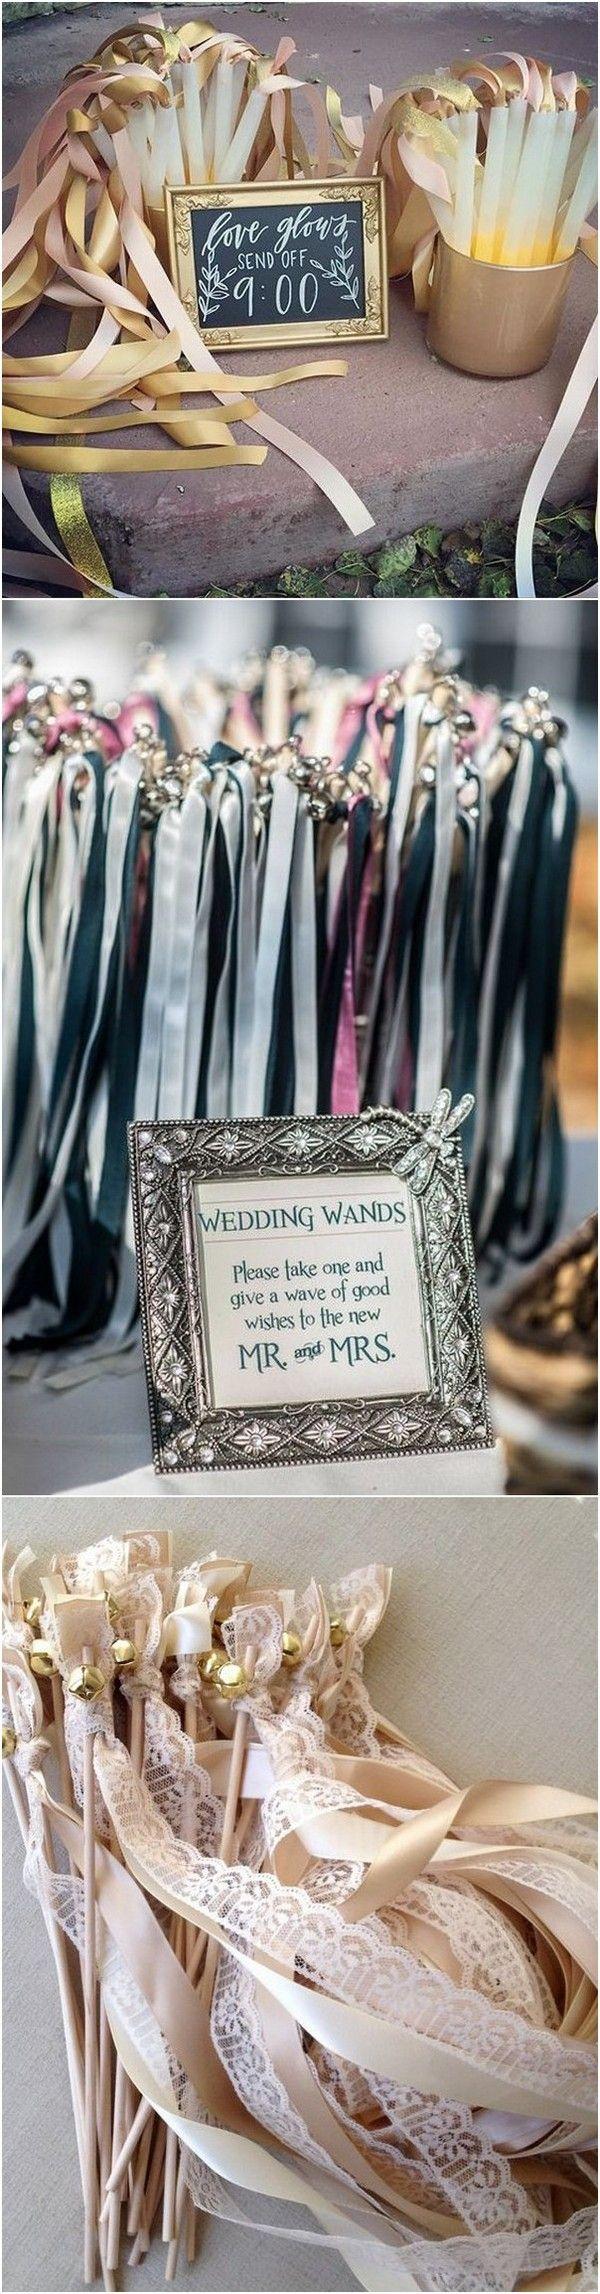 30 Creative Wedding Send Off Ideas for 2019 Trends